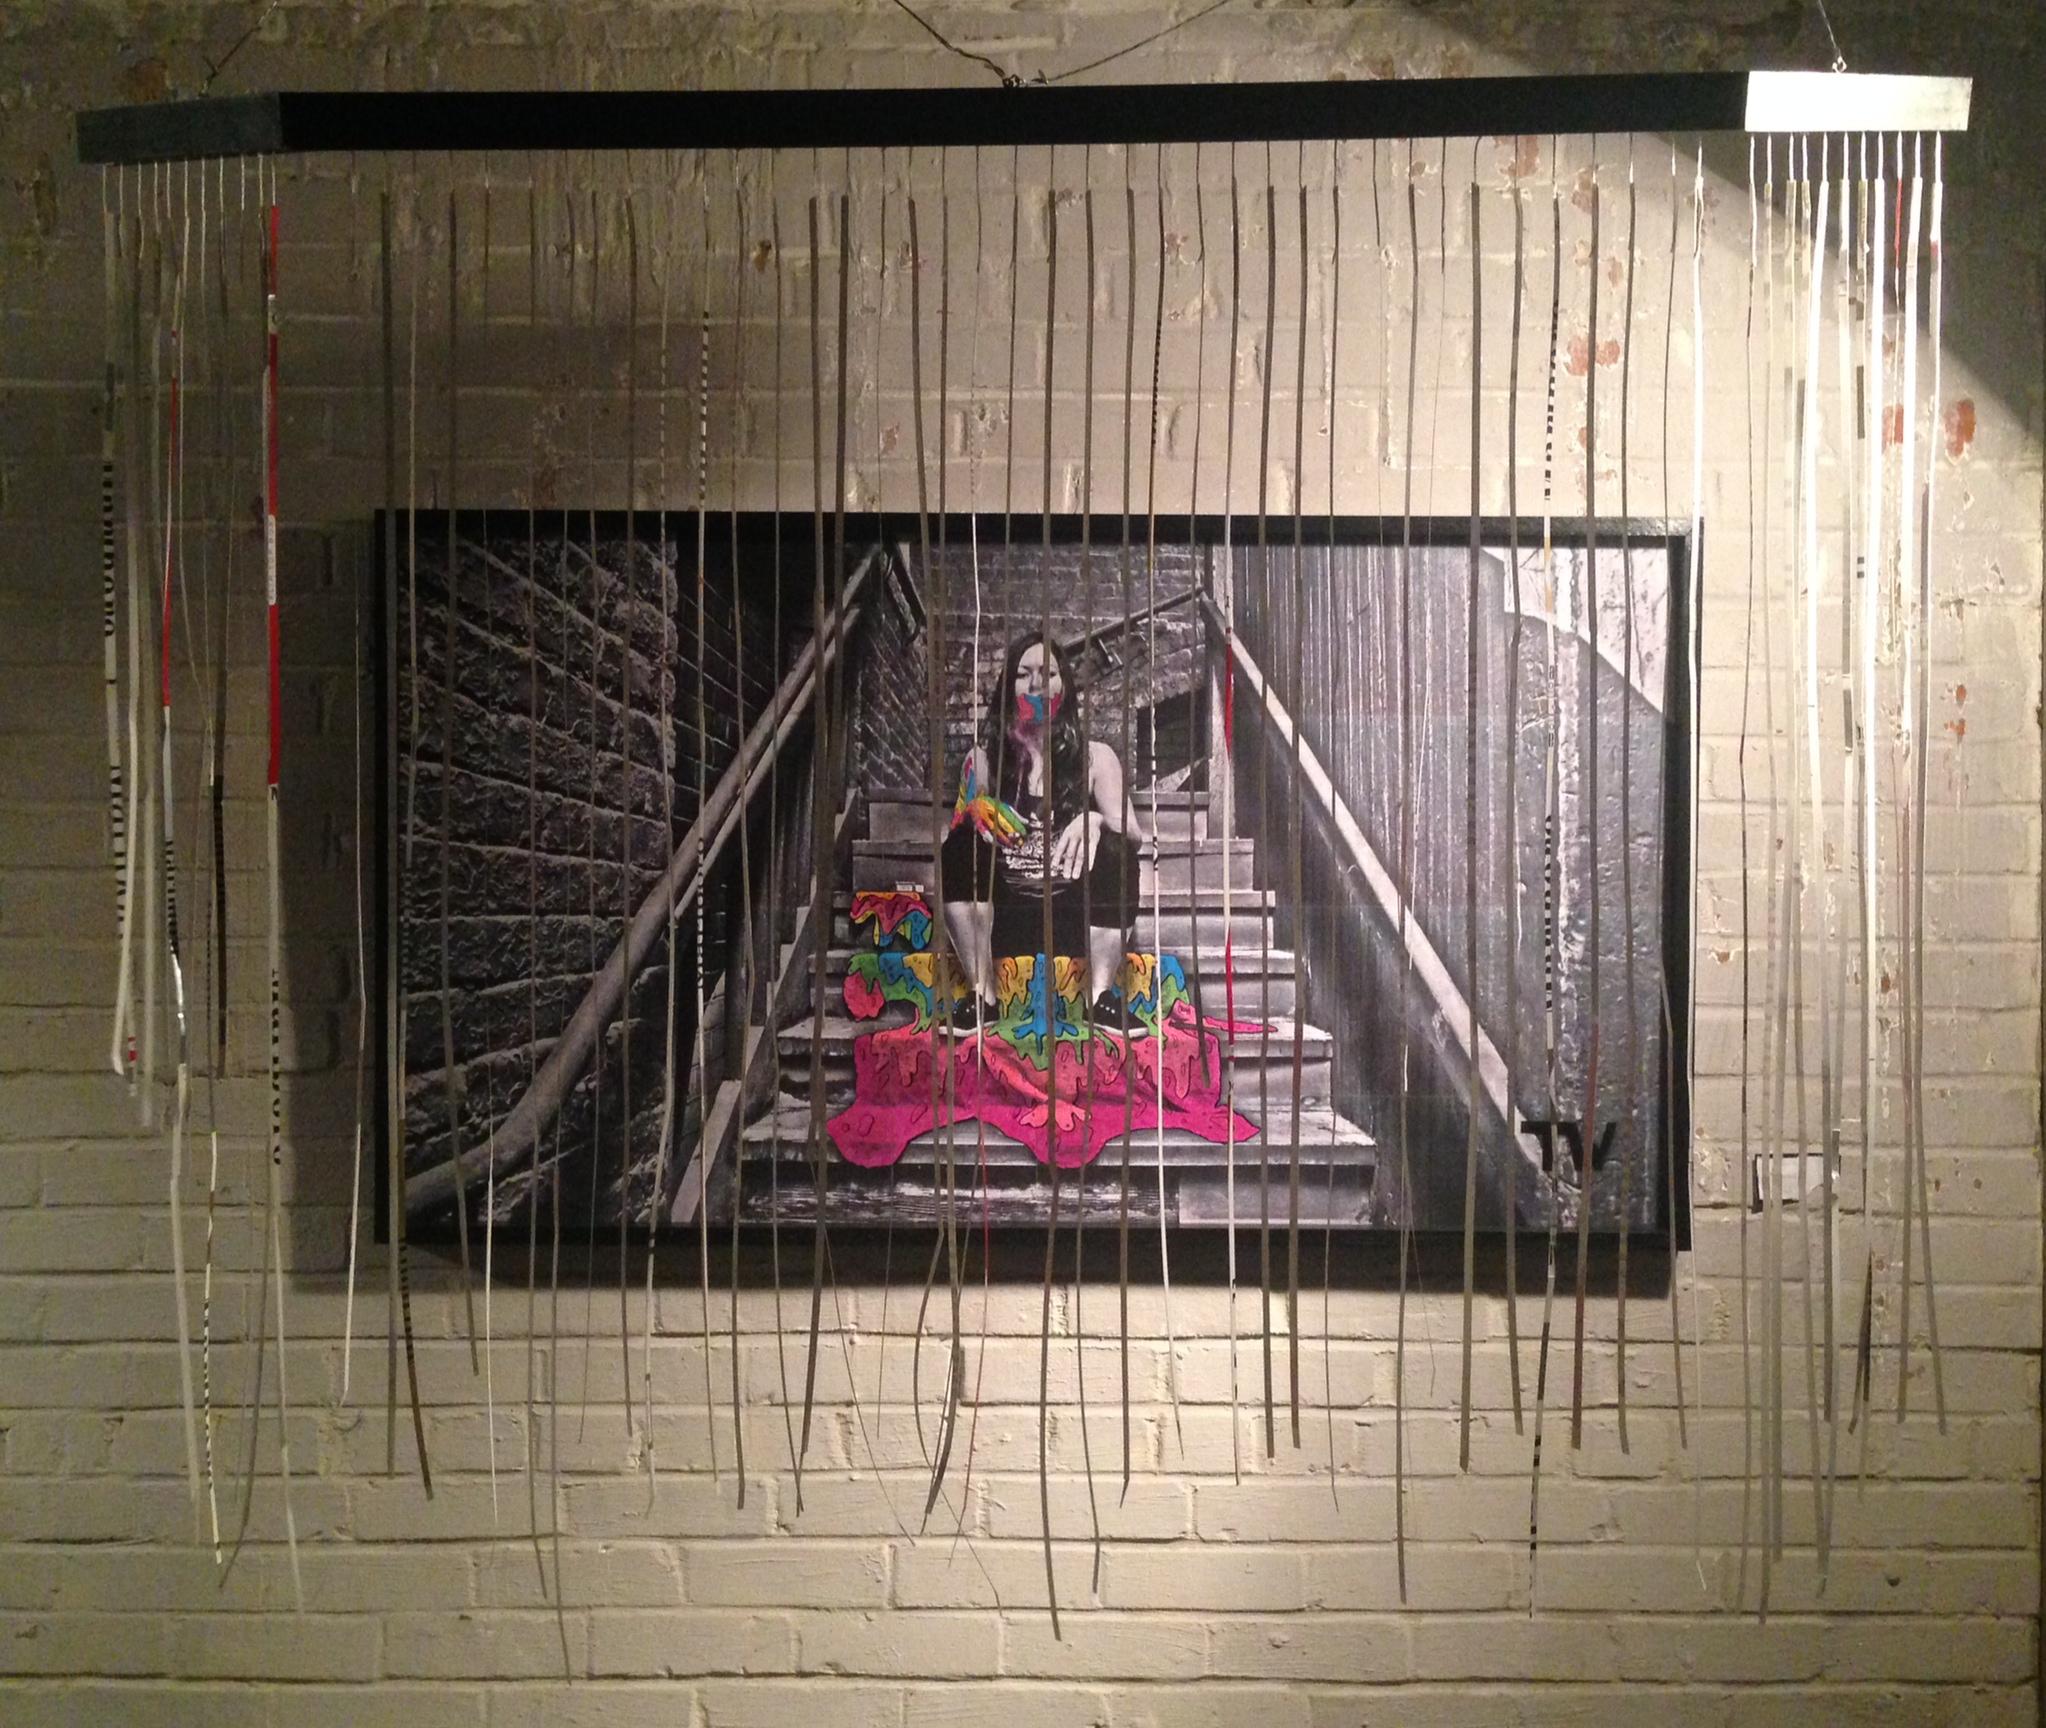 Smoke Girl by Tony Waldron - Laser jet - Prismacolor ink marker - paint marker - wheat paste - 53 x 30, 2014 0.00